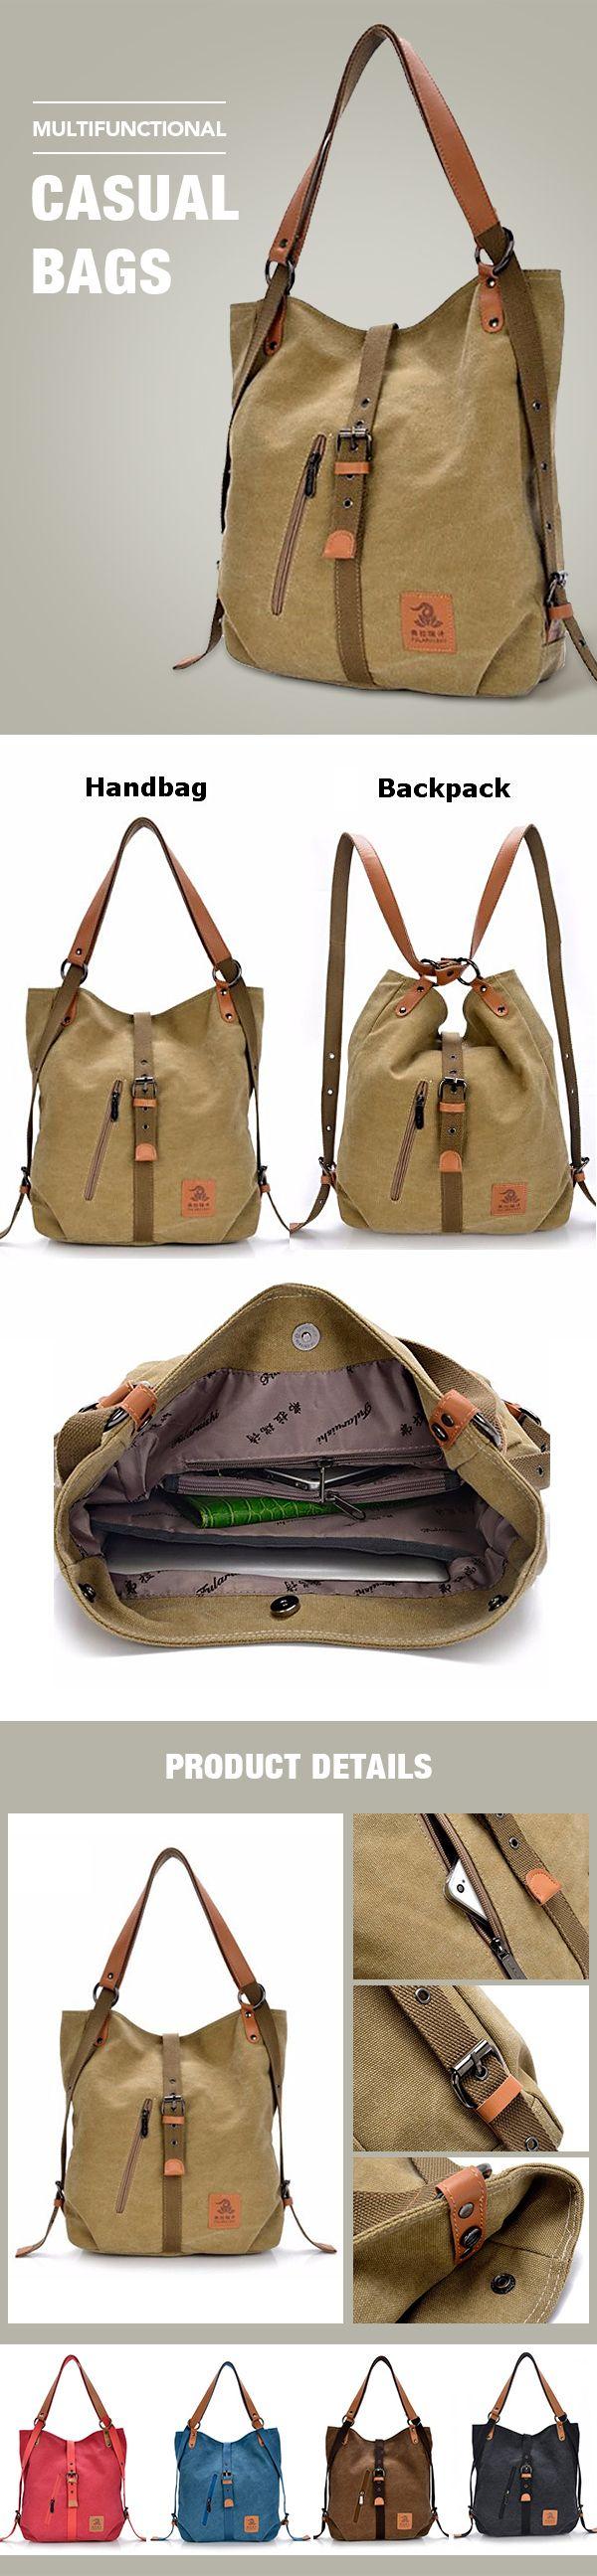 8e825253c950 US$28.66 Women Canvas Casual Multifunctional Microfiber Leather ...